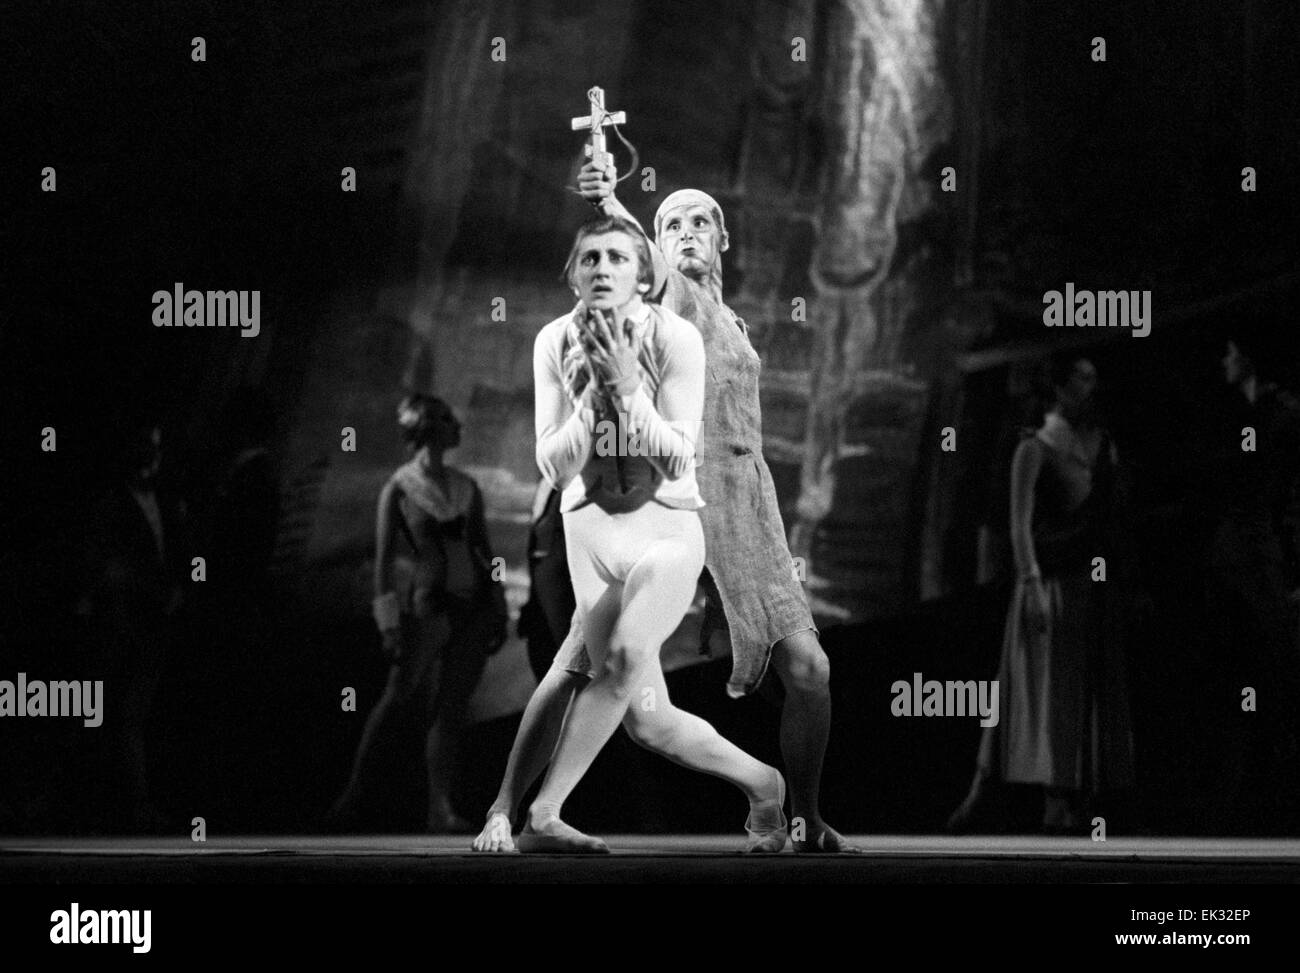 Leningrad. Urss. Ballet 'Idiot' organisé à Leningrad Ballet. Ballerine Valery Mikhaïlovski Photo Stock